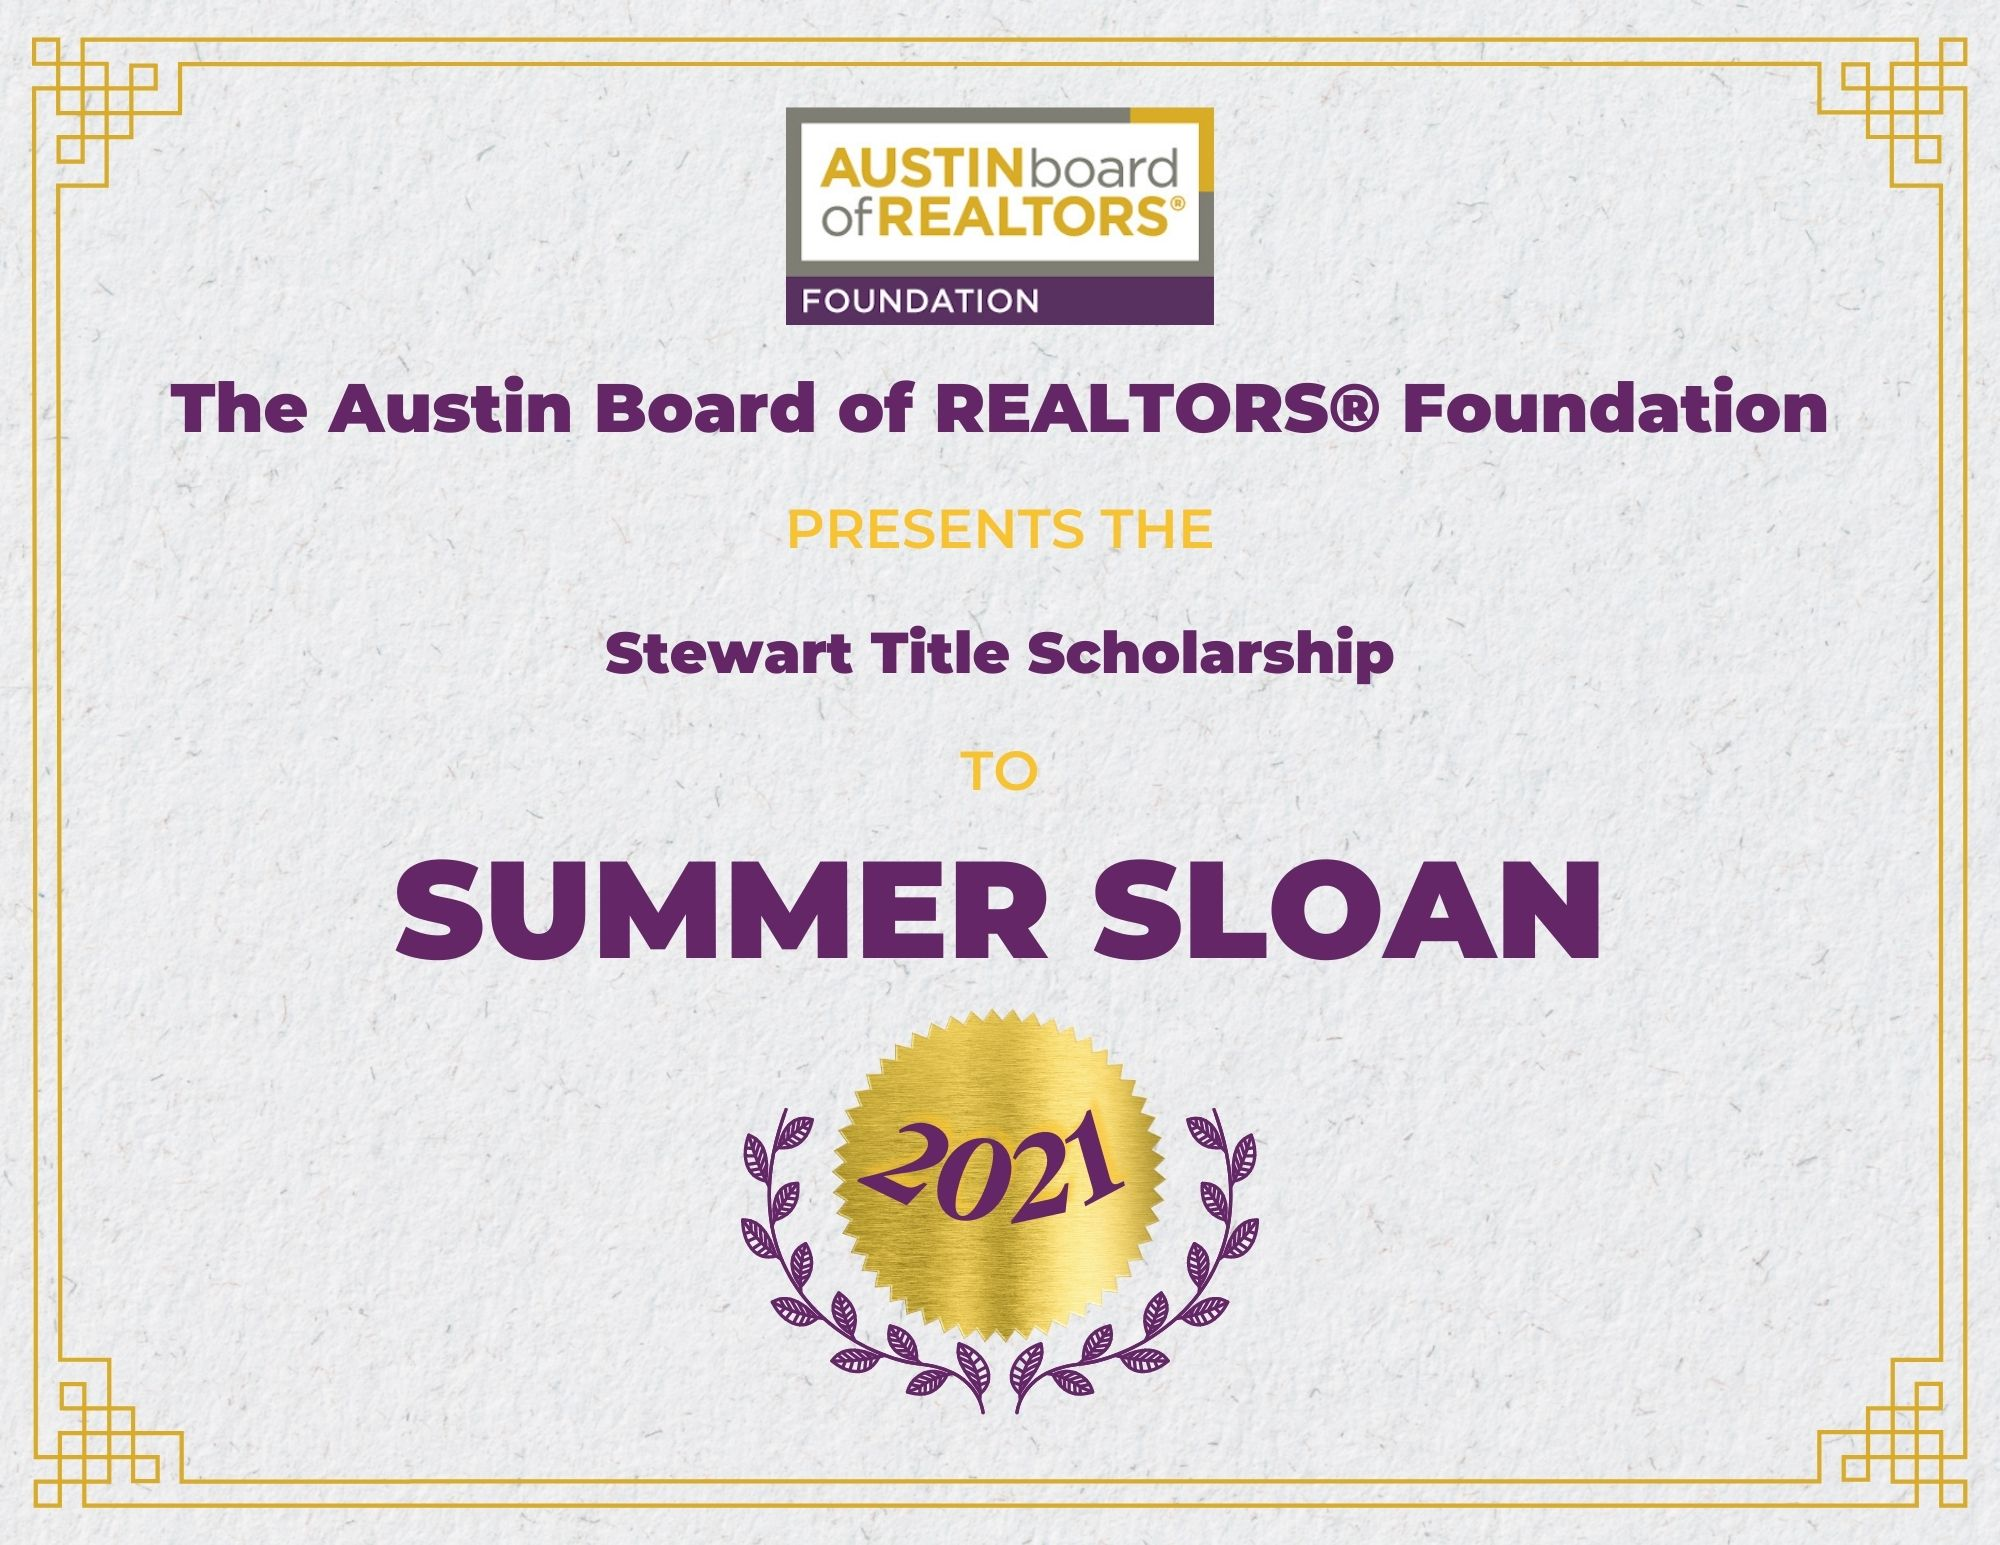 2021 Fou Scholarship Certificate Summersloan